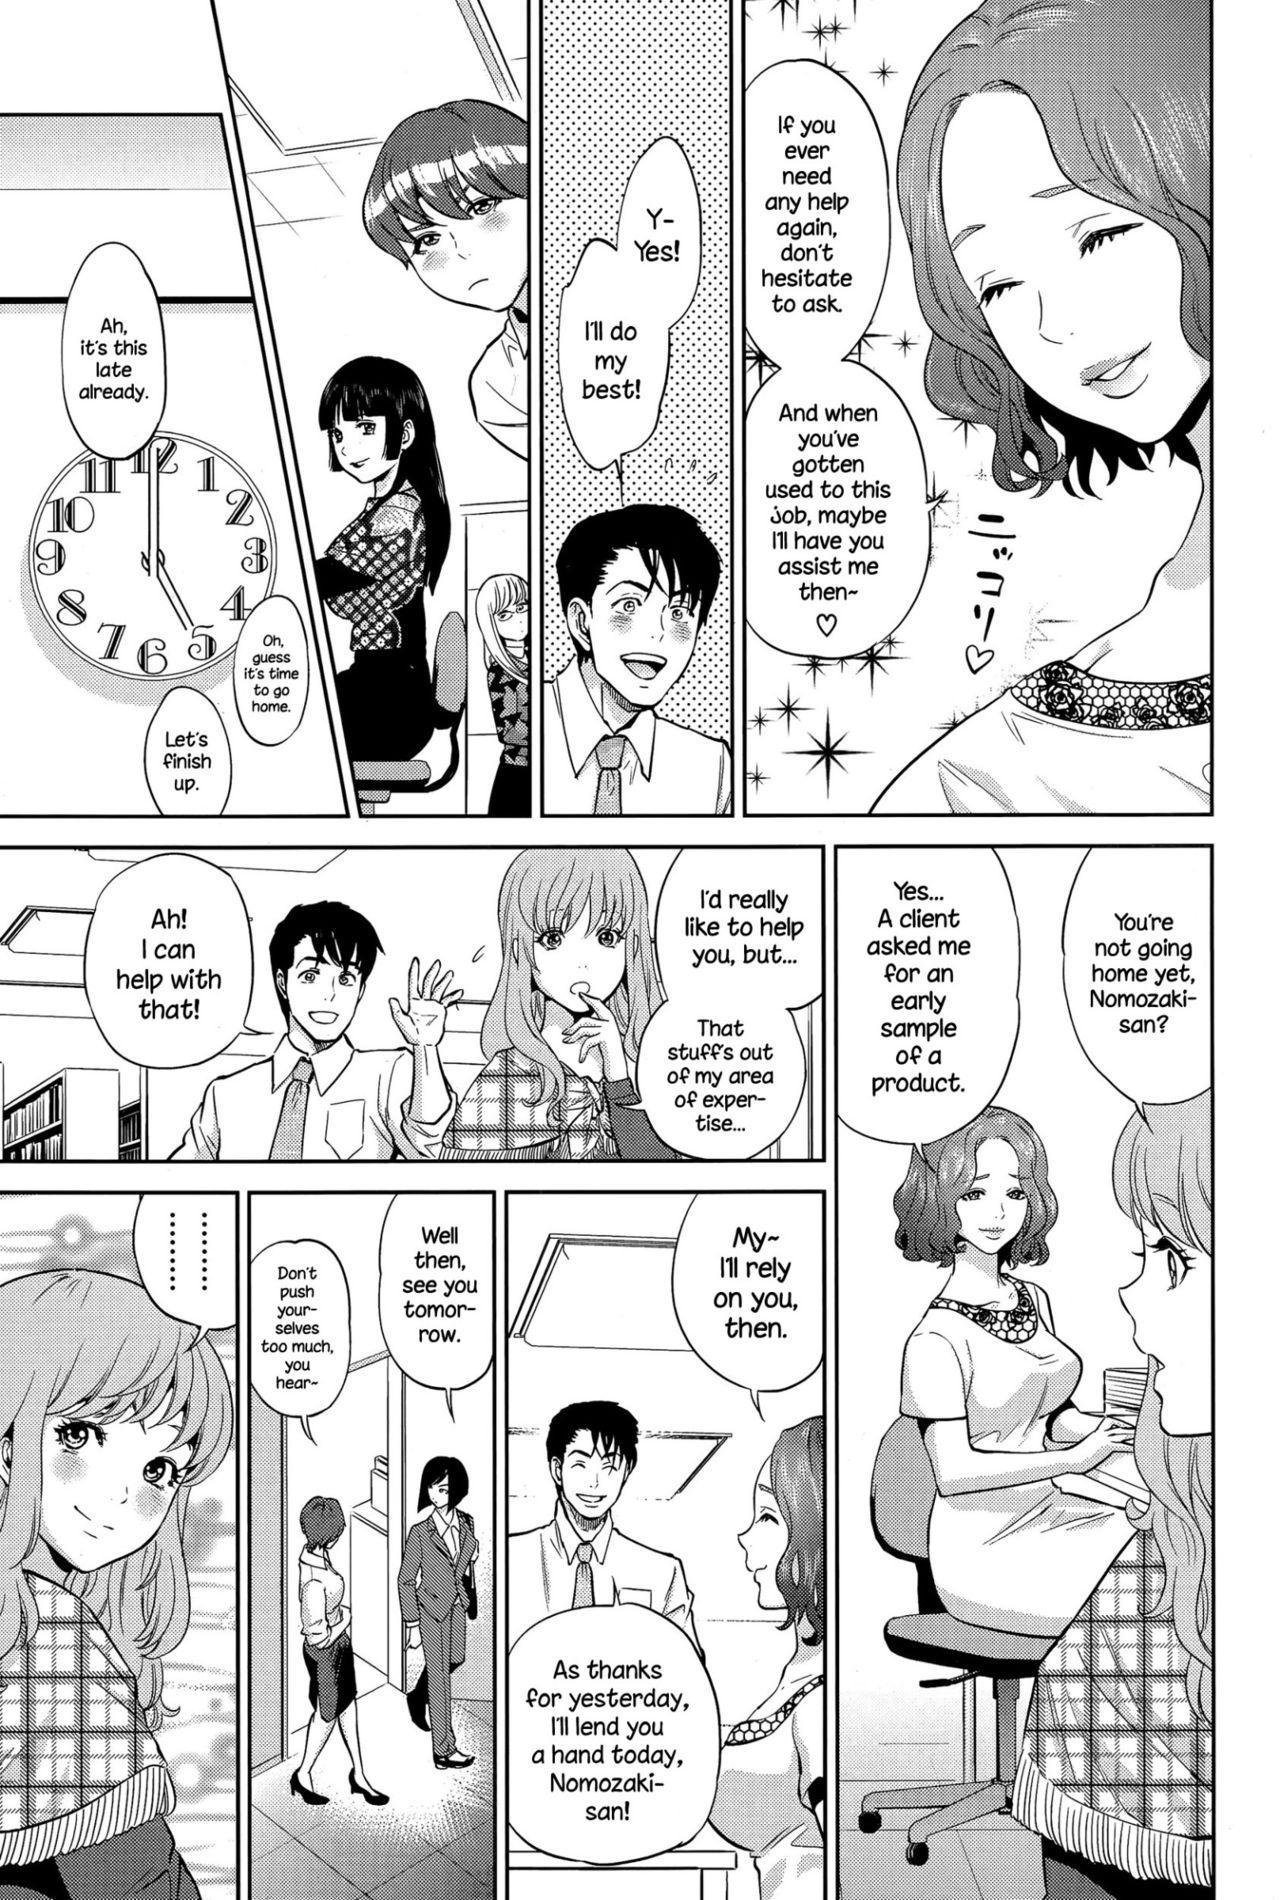 Yuuwaku Office | Office Love Scramble 79